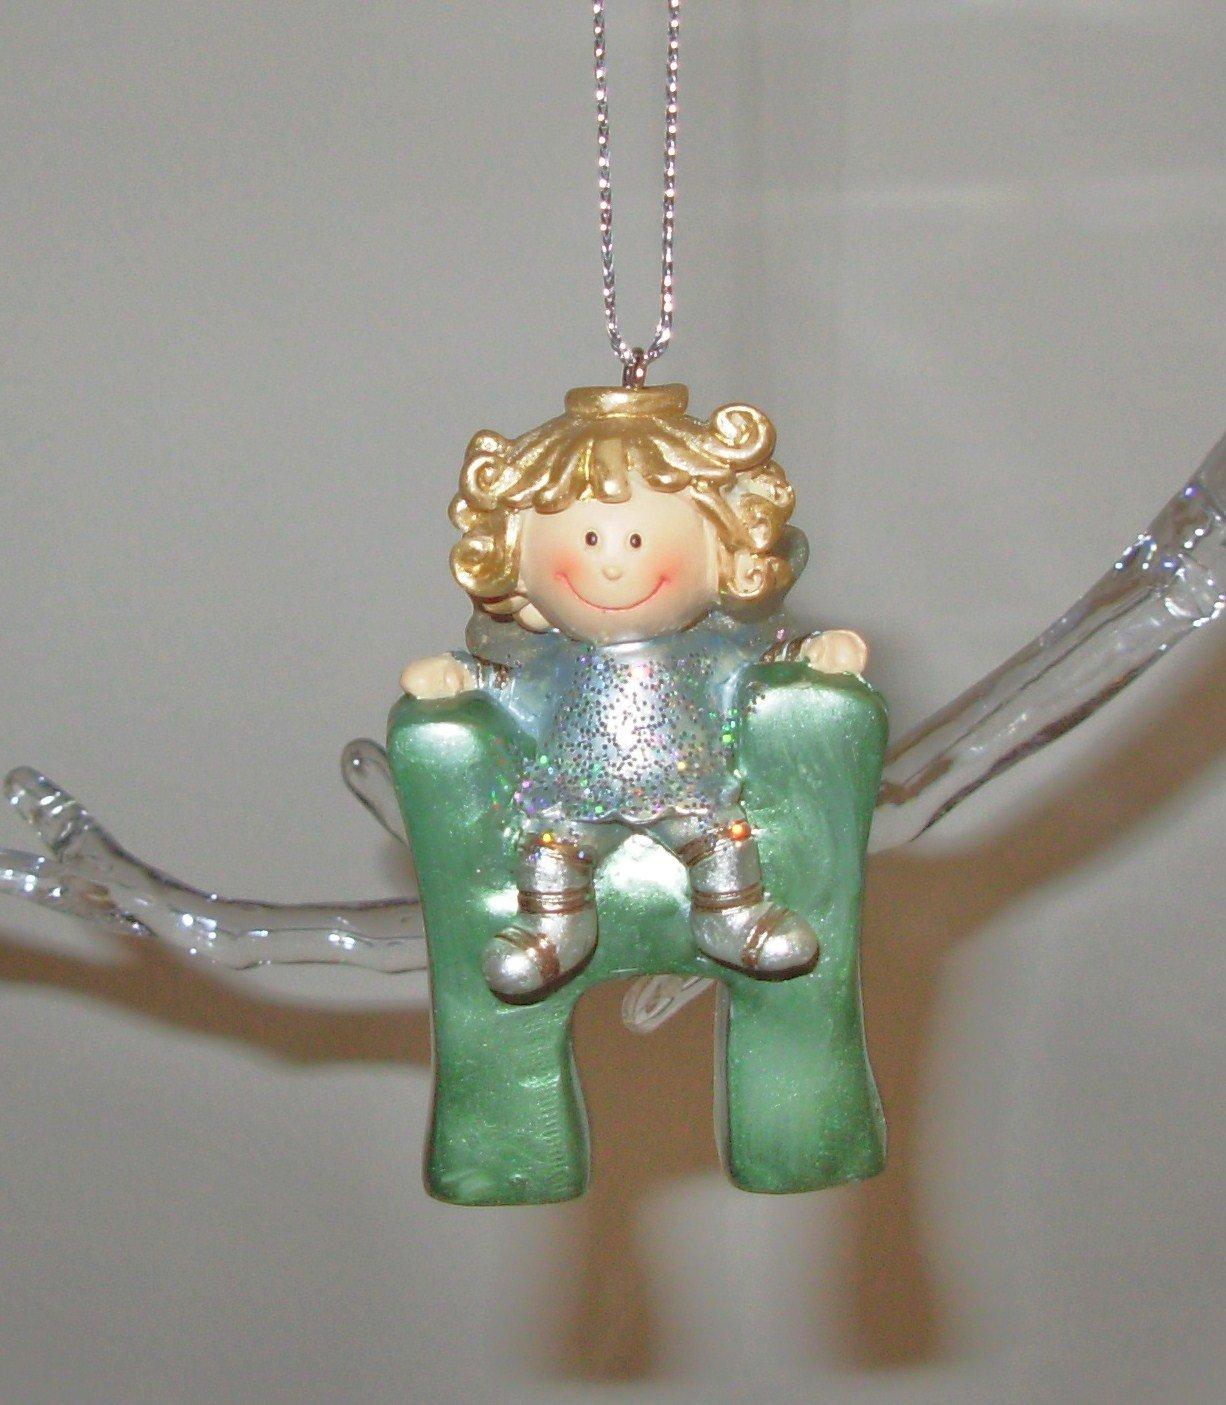 ANGEL ORNAMENT INITIAL H CHRISTMAS HOME DECOR HOLIDAY BIRTHDAY NEW GANZ